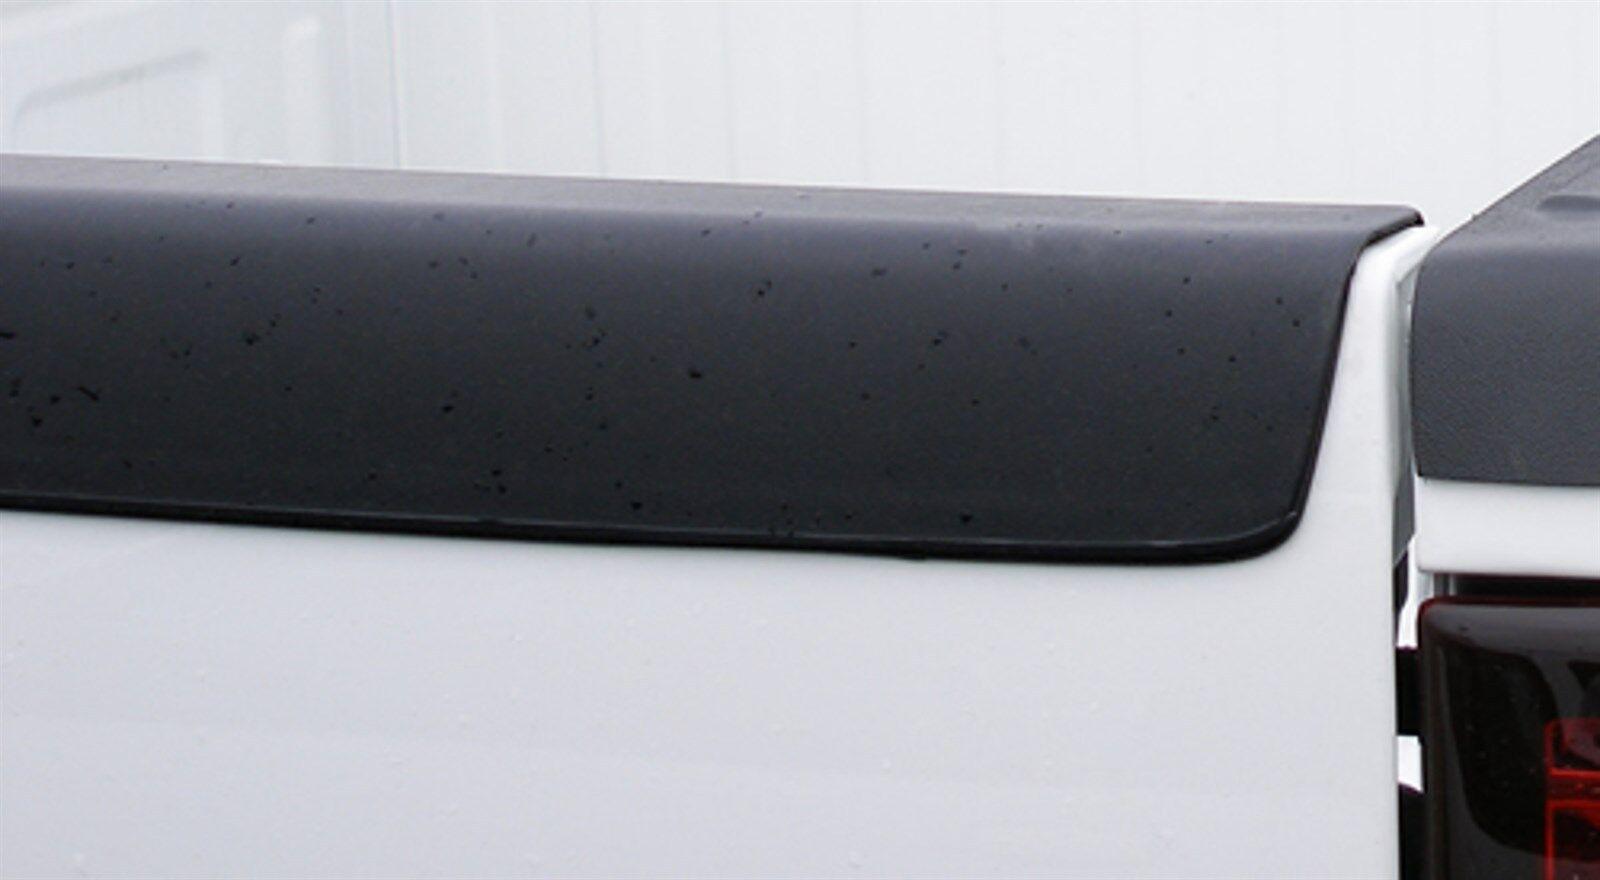 stampede brc0007 tailgate cap protector 99 06 chevy silverado gmc sierra black 749393055876 ebay. Black Bedroom Furniture Sets. Home Design Ideas